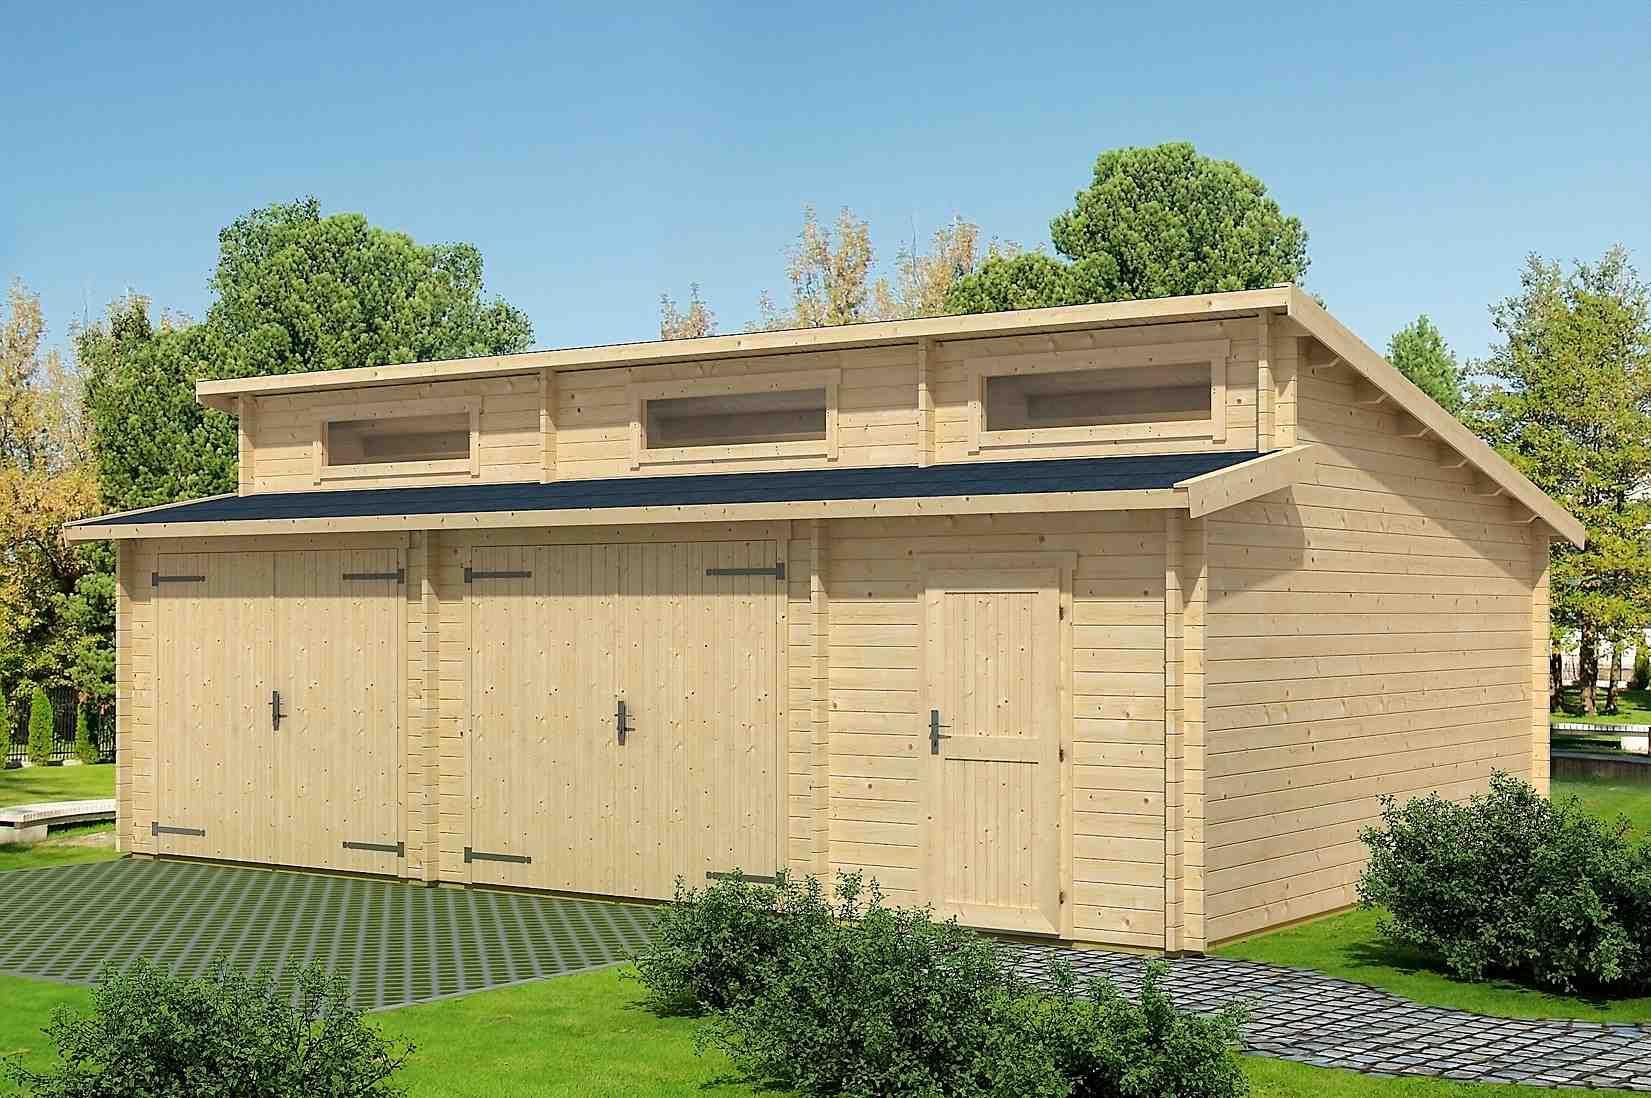 Holzgarage H157 inkl. Holztor - 44 mm Blockbohlenhaus, Grundfläche: 40,50 m², Stufendach